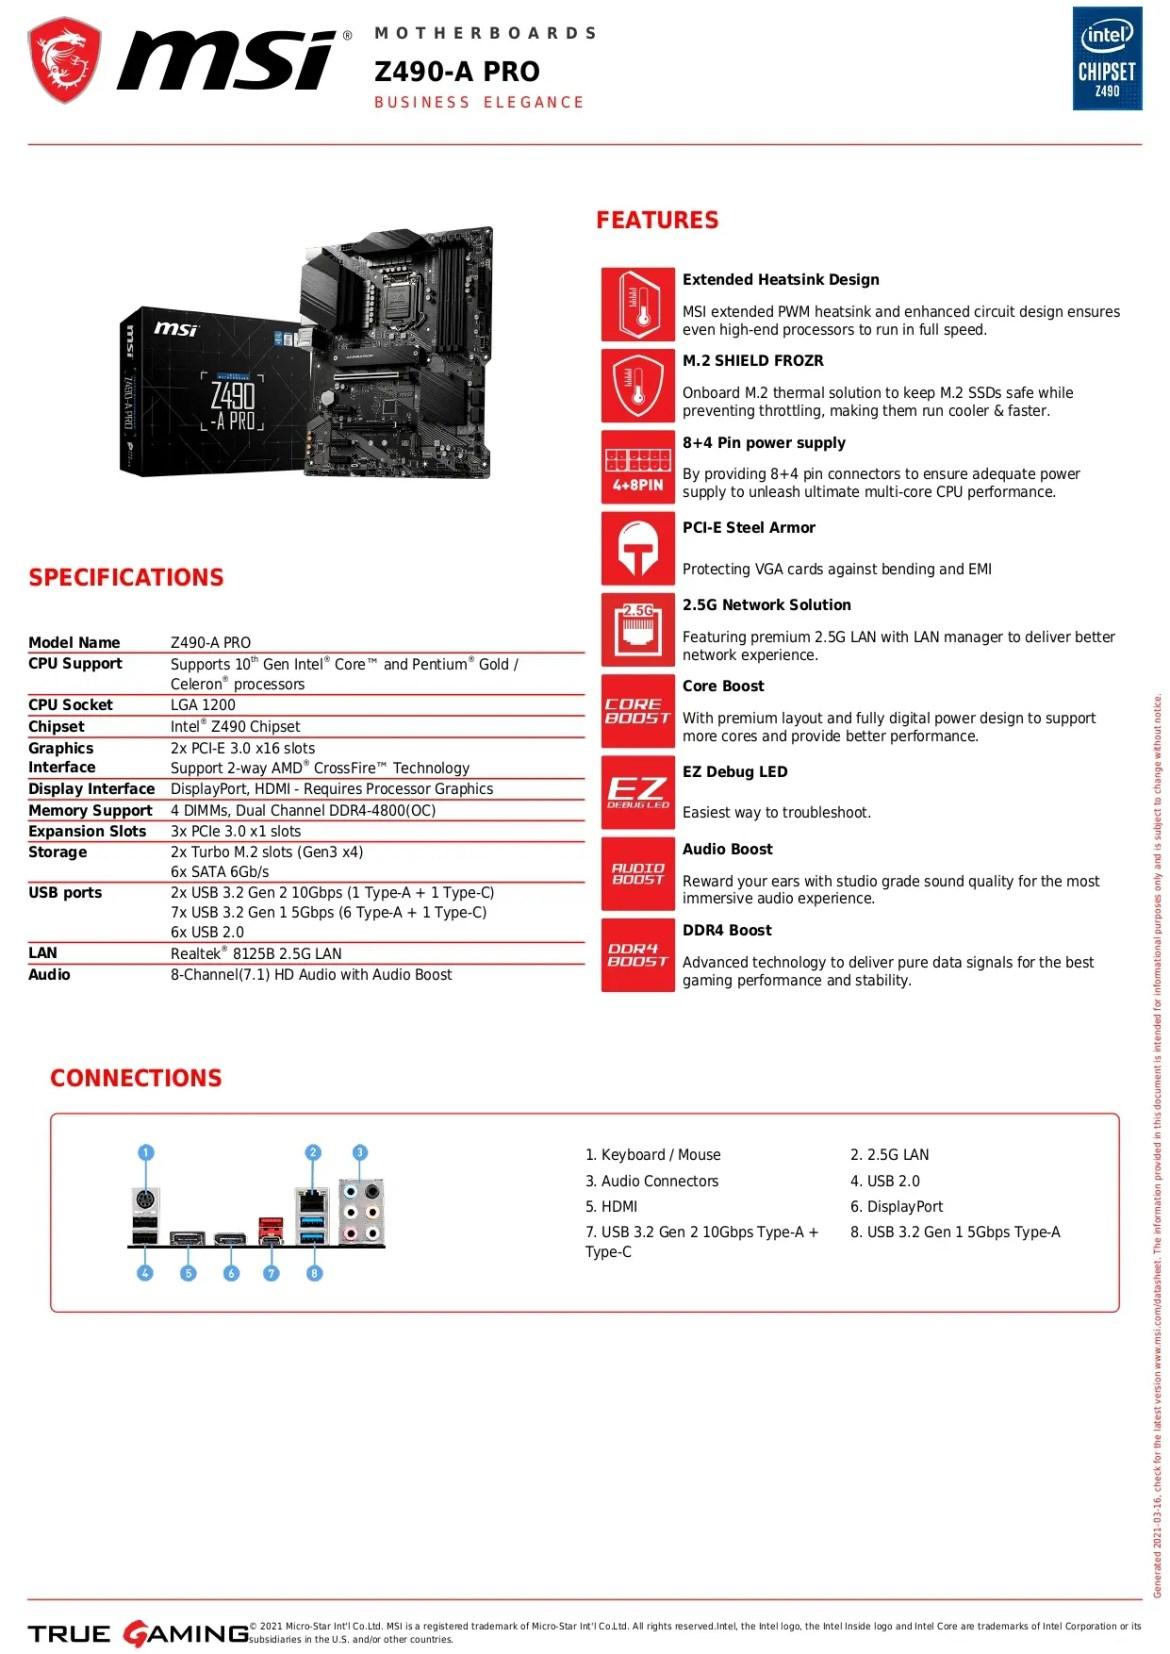 MSI Z490-A PRO LGA 1200 Intel 10th Gen DDR4 M.2 USB 3.2 SATA 6 GB/s ATX Intel Motherboard